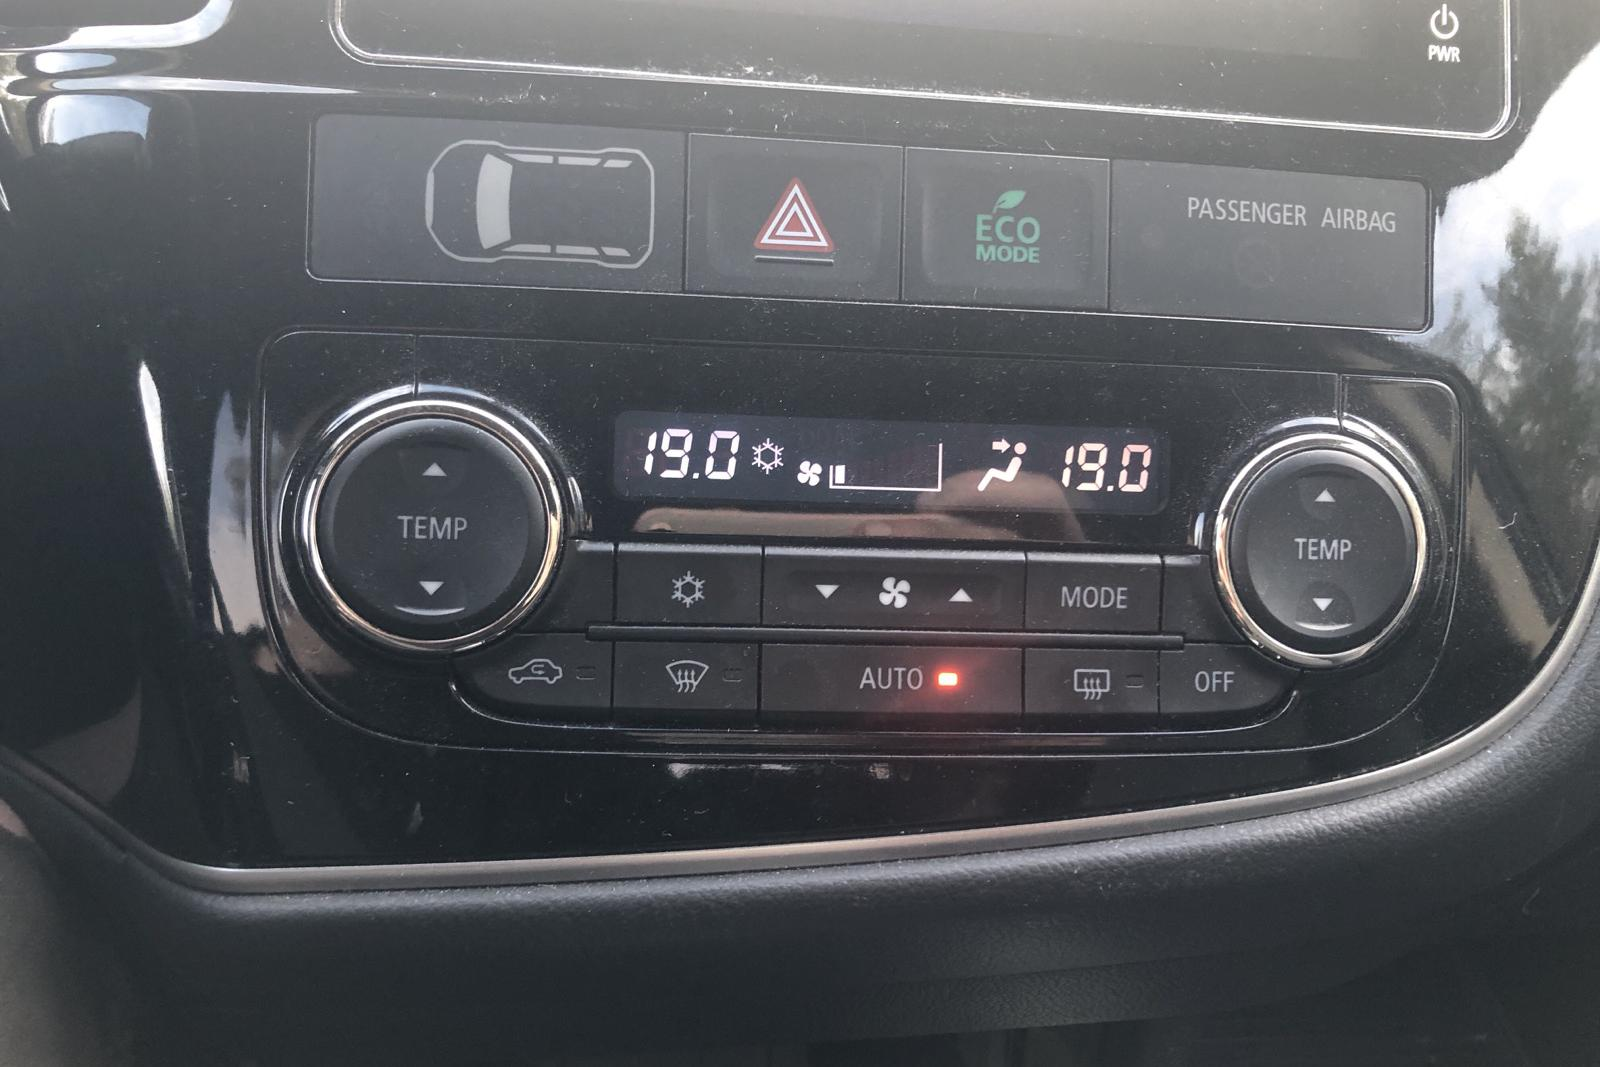 Mitsubishi Outlander 2.0 Plug-in Hybrid 4WD (121hk) - 127 170 km - Automatic - white - 2017